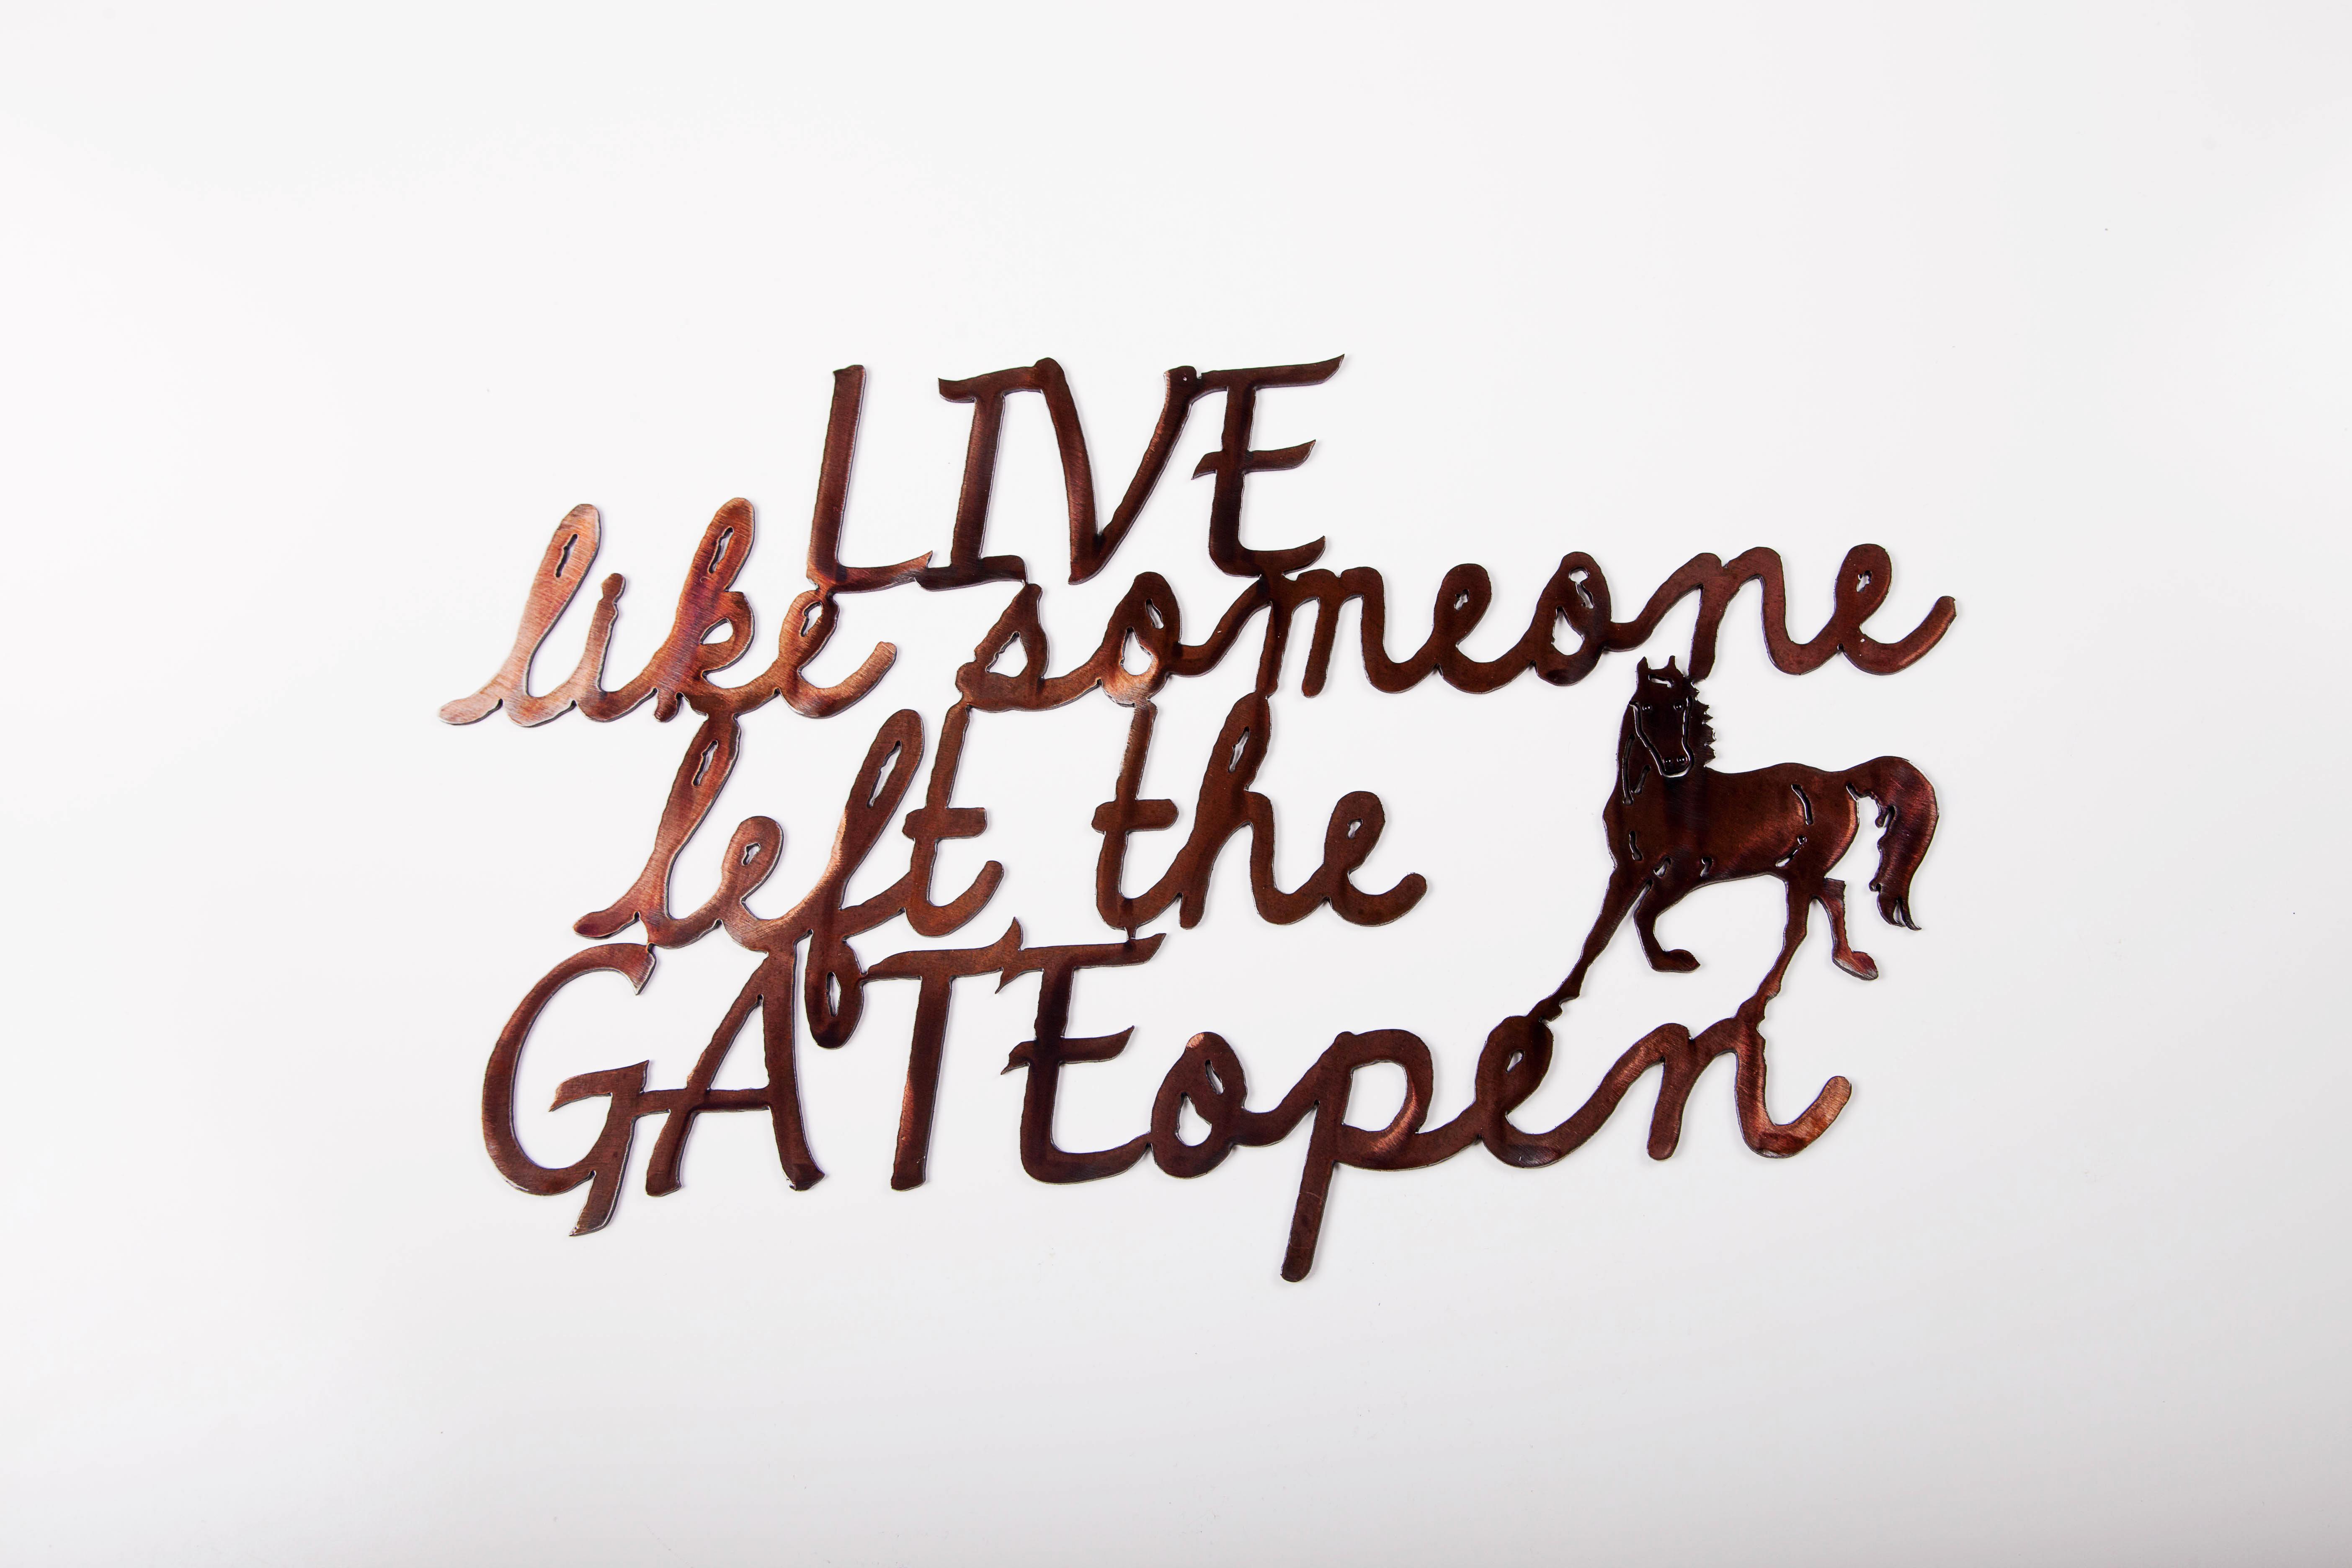 Live like Gate Open